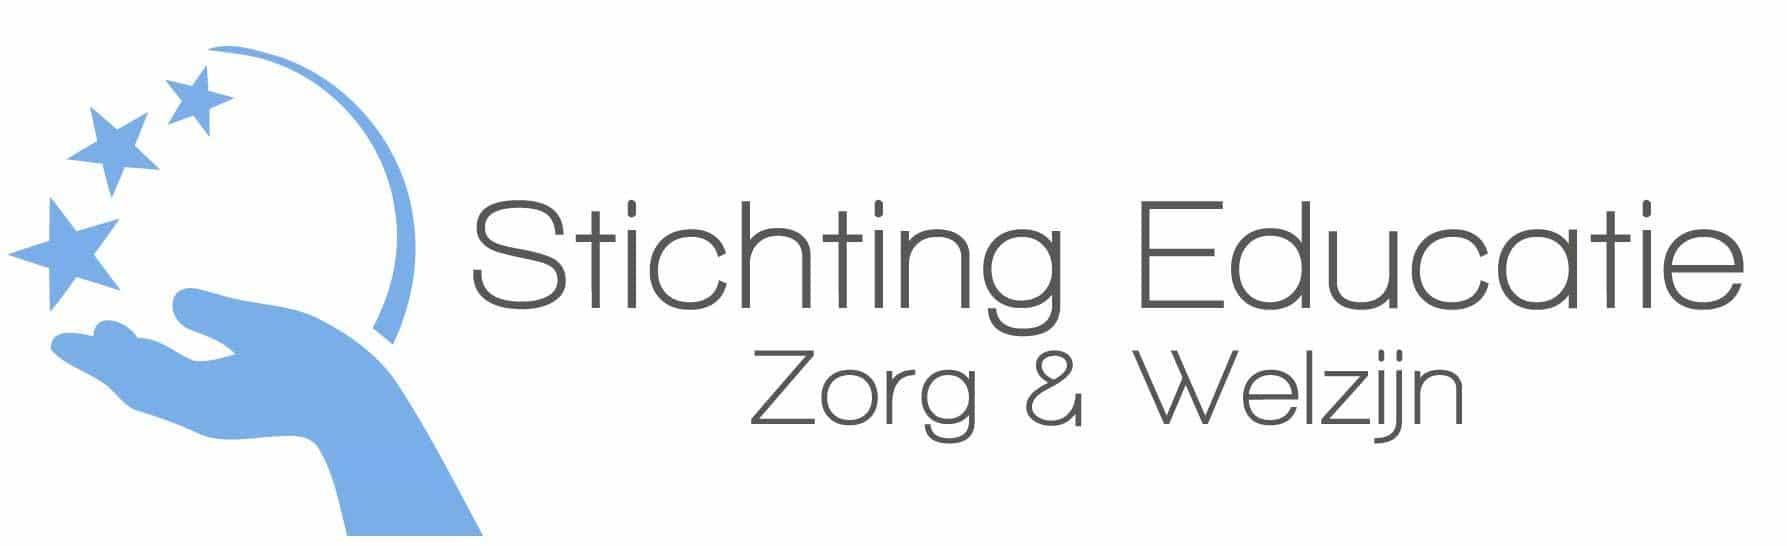 https://archief.nieuwegeneratieouderenzorg.nl/wp-content/uploads/2015/12/logo-sezw_verkleind.jpg